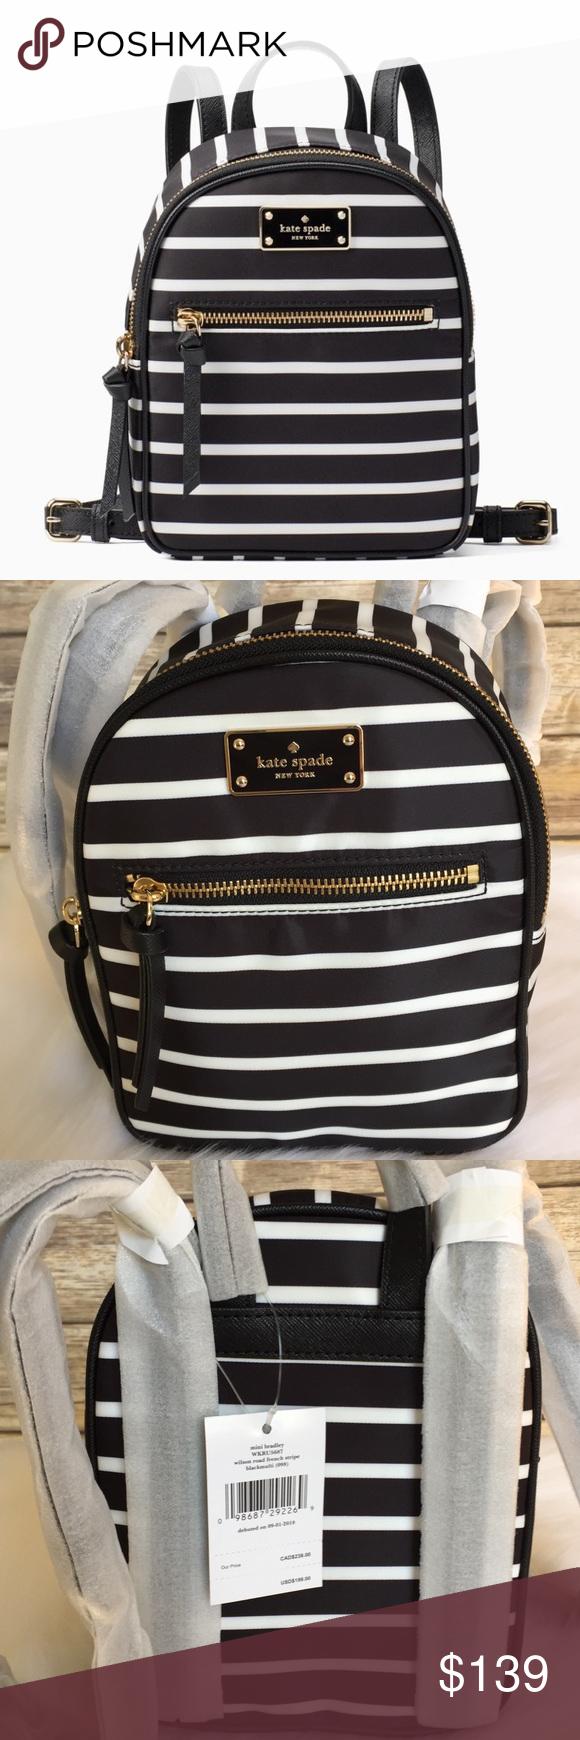 2388ba79f9e3 Kate spade MINI Bradley Wilson stripe backpack bag New with tag   authentic  guaranteed! 100% Authentic Kate Spade! Buy with confidence!